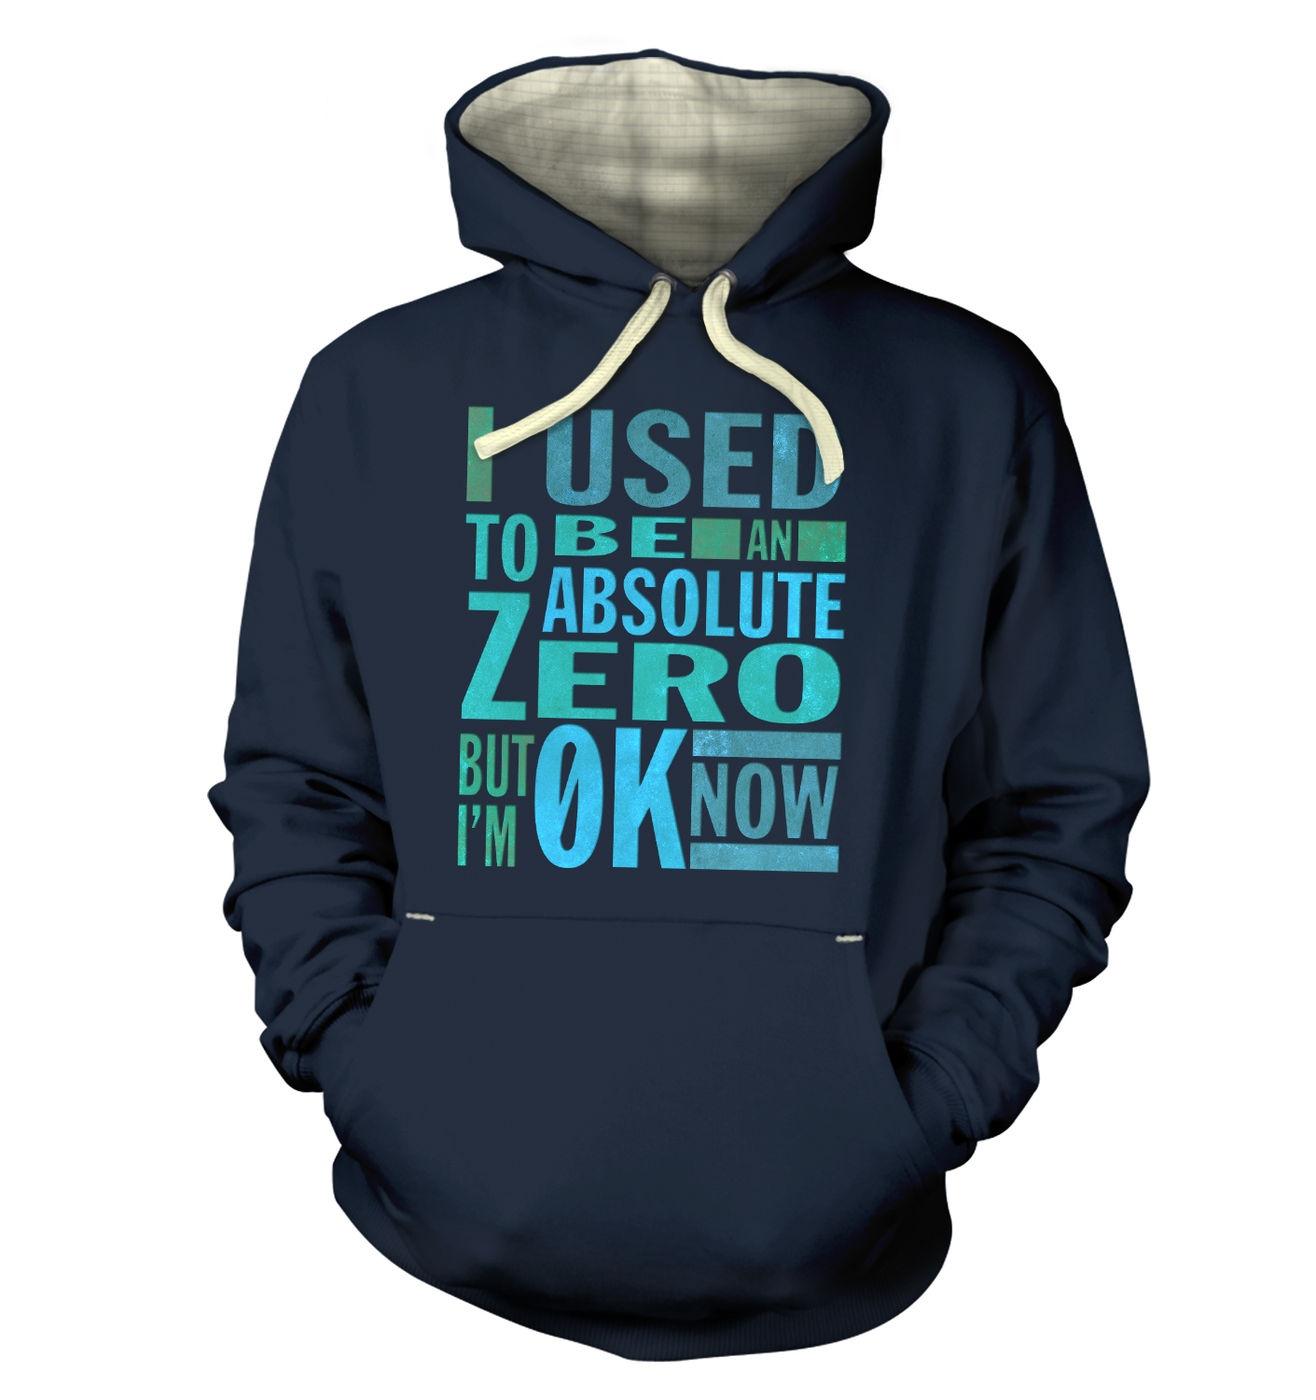 Absolute Zero 0K Now premium hoodie - cosy funny science slogan hoody